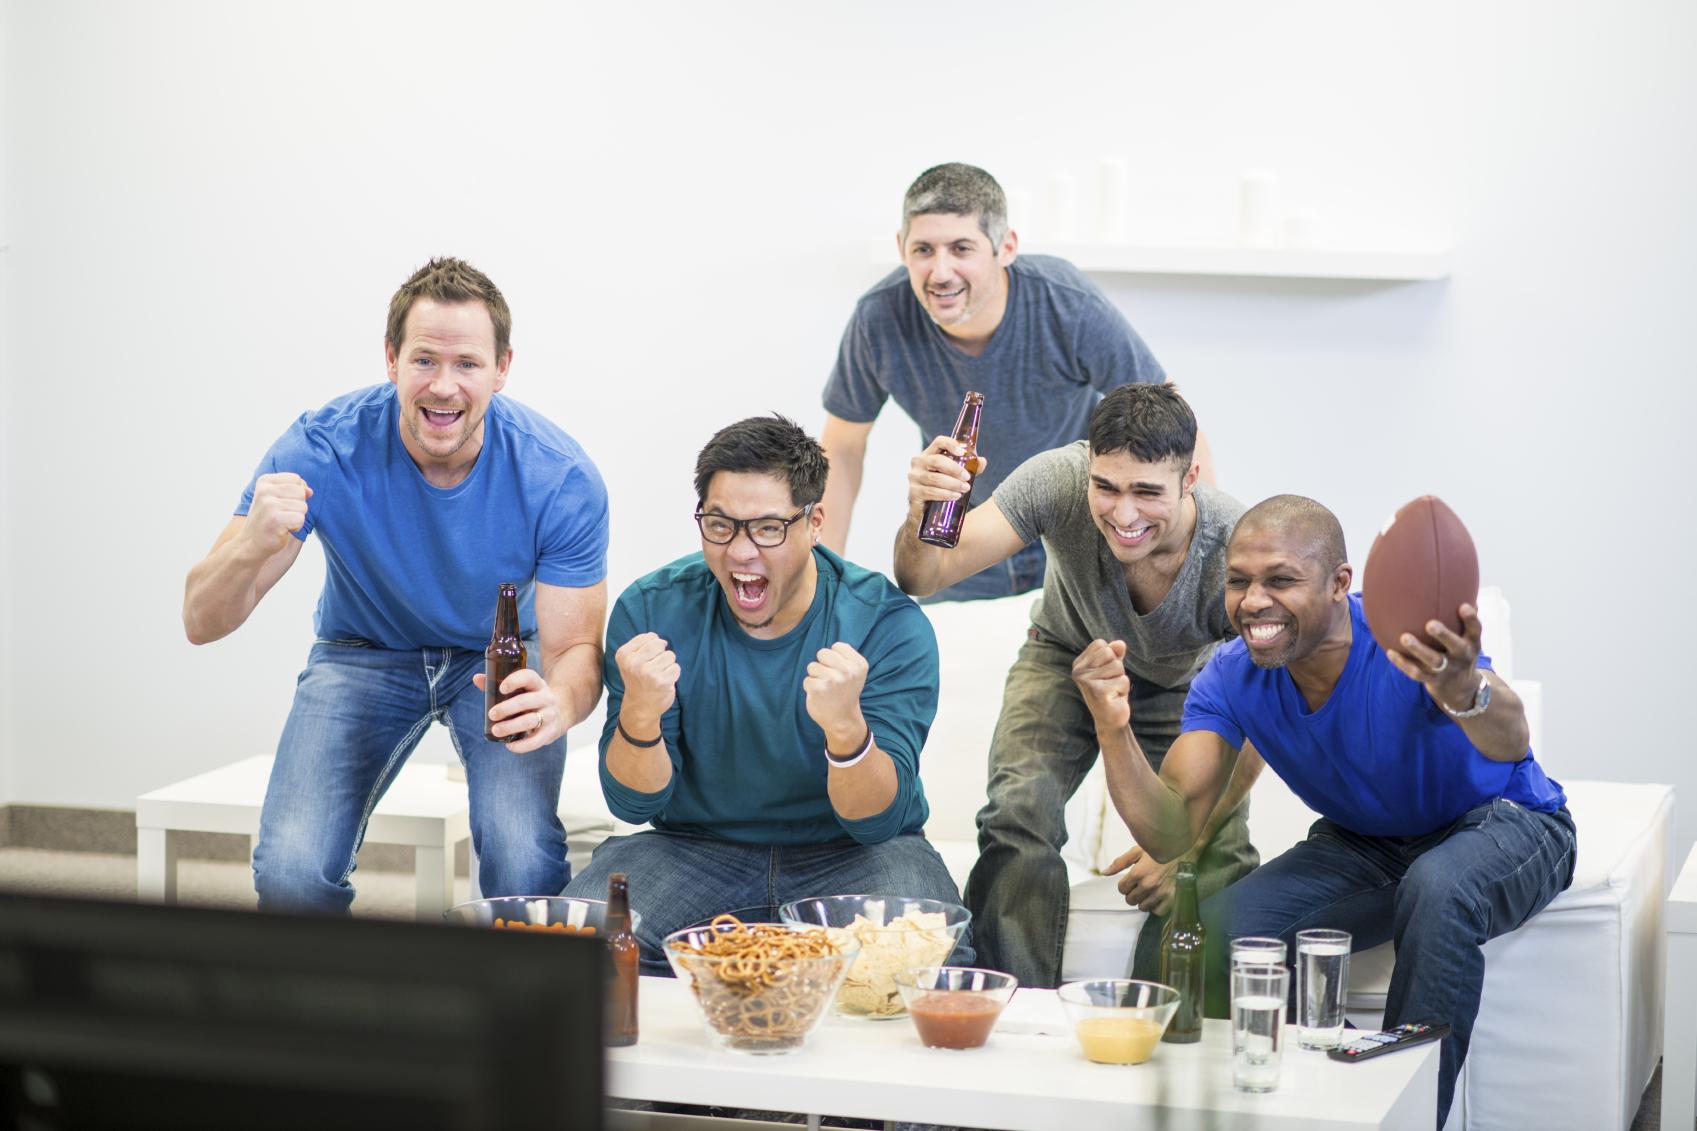 4 Ways Super Bowl XLIX Can Shape Your B2B Marketing Campaign